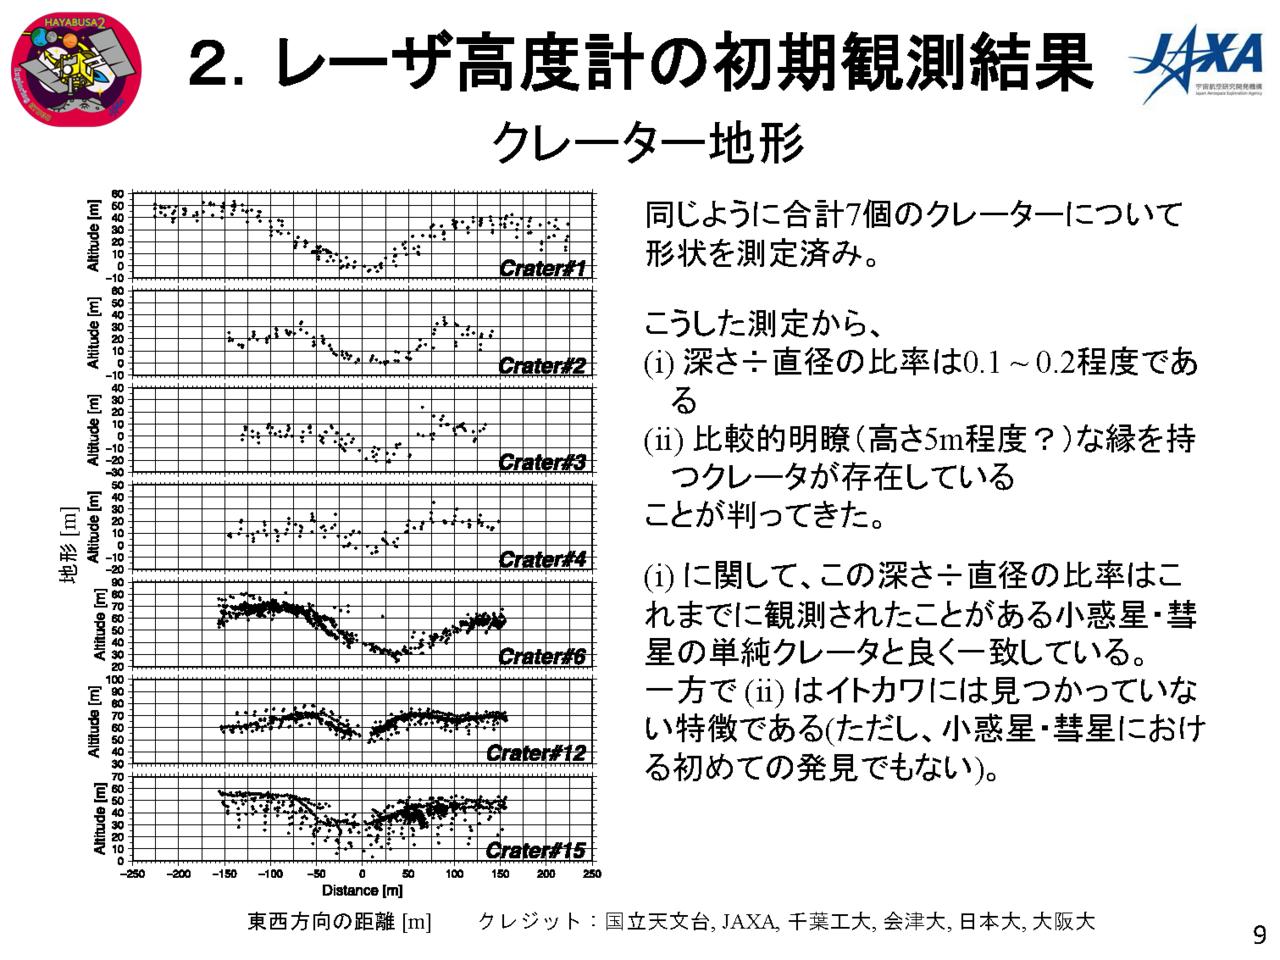 f:id:Imamura:20180802145929p:plain